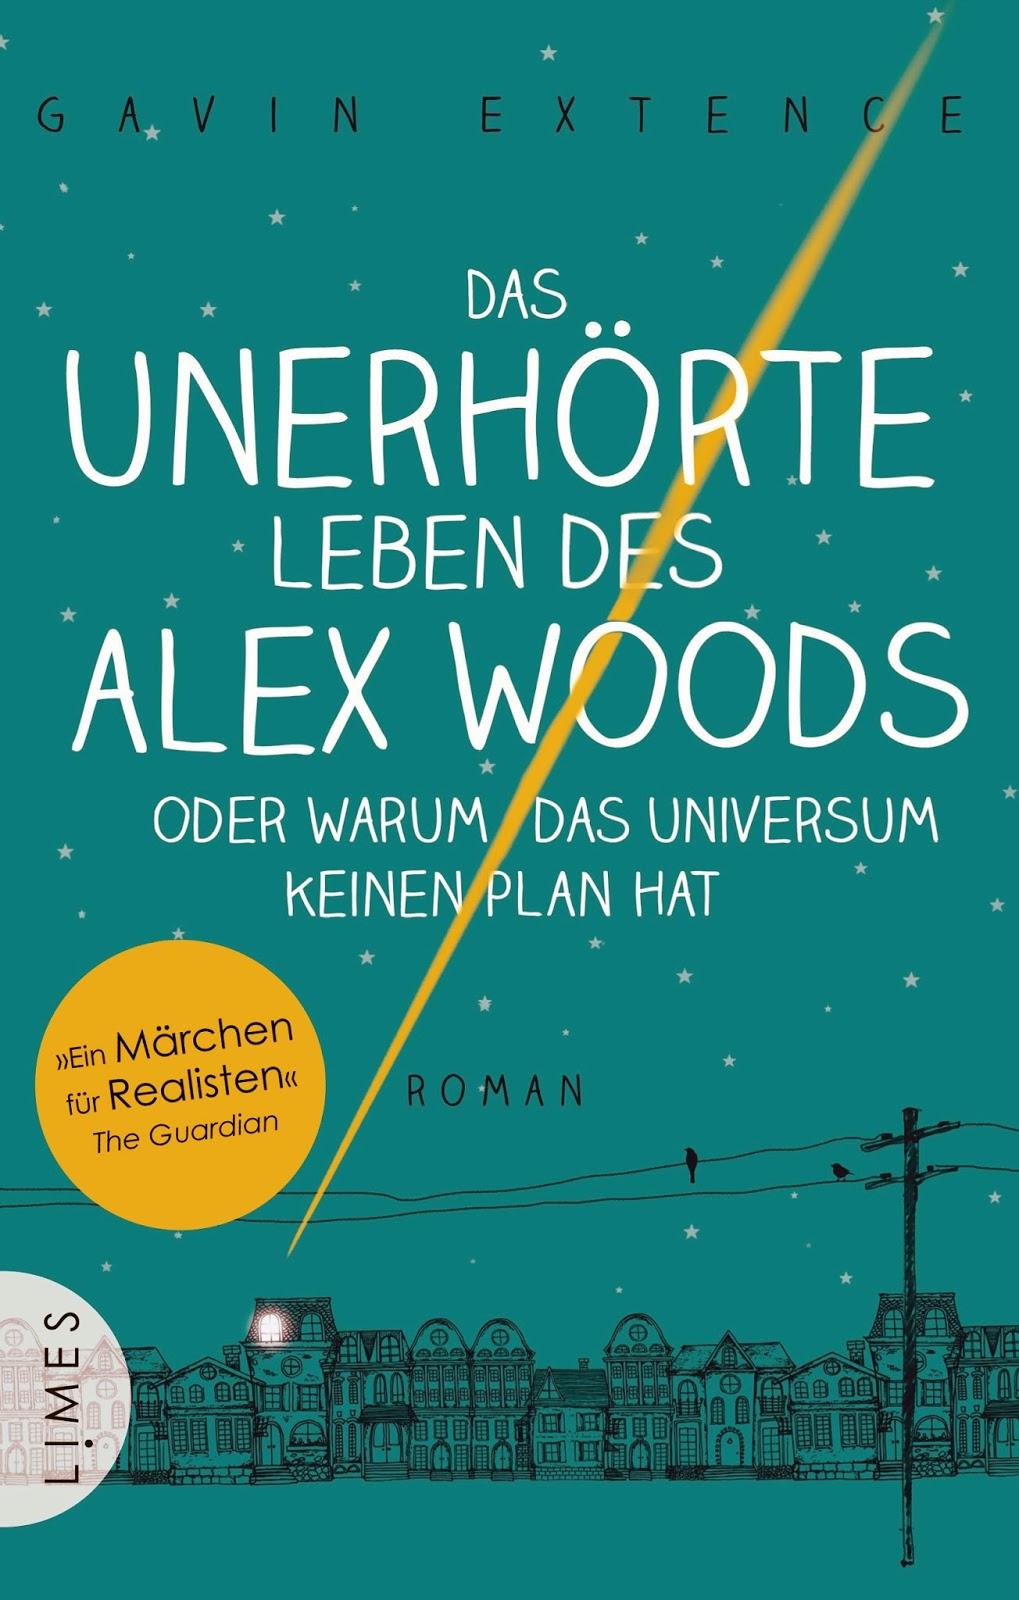 http://www.amazon.de/unerh%C3%B6rte-Leben-Woods-Universum-keinen/dp/3809026336/ref=sr_1_1?ie=UTF8&qid=1393676496&sr=8-1&keywords=das+unerh%C3%B6rte+leben+des+alex+woods